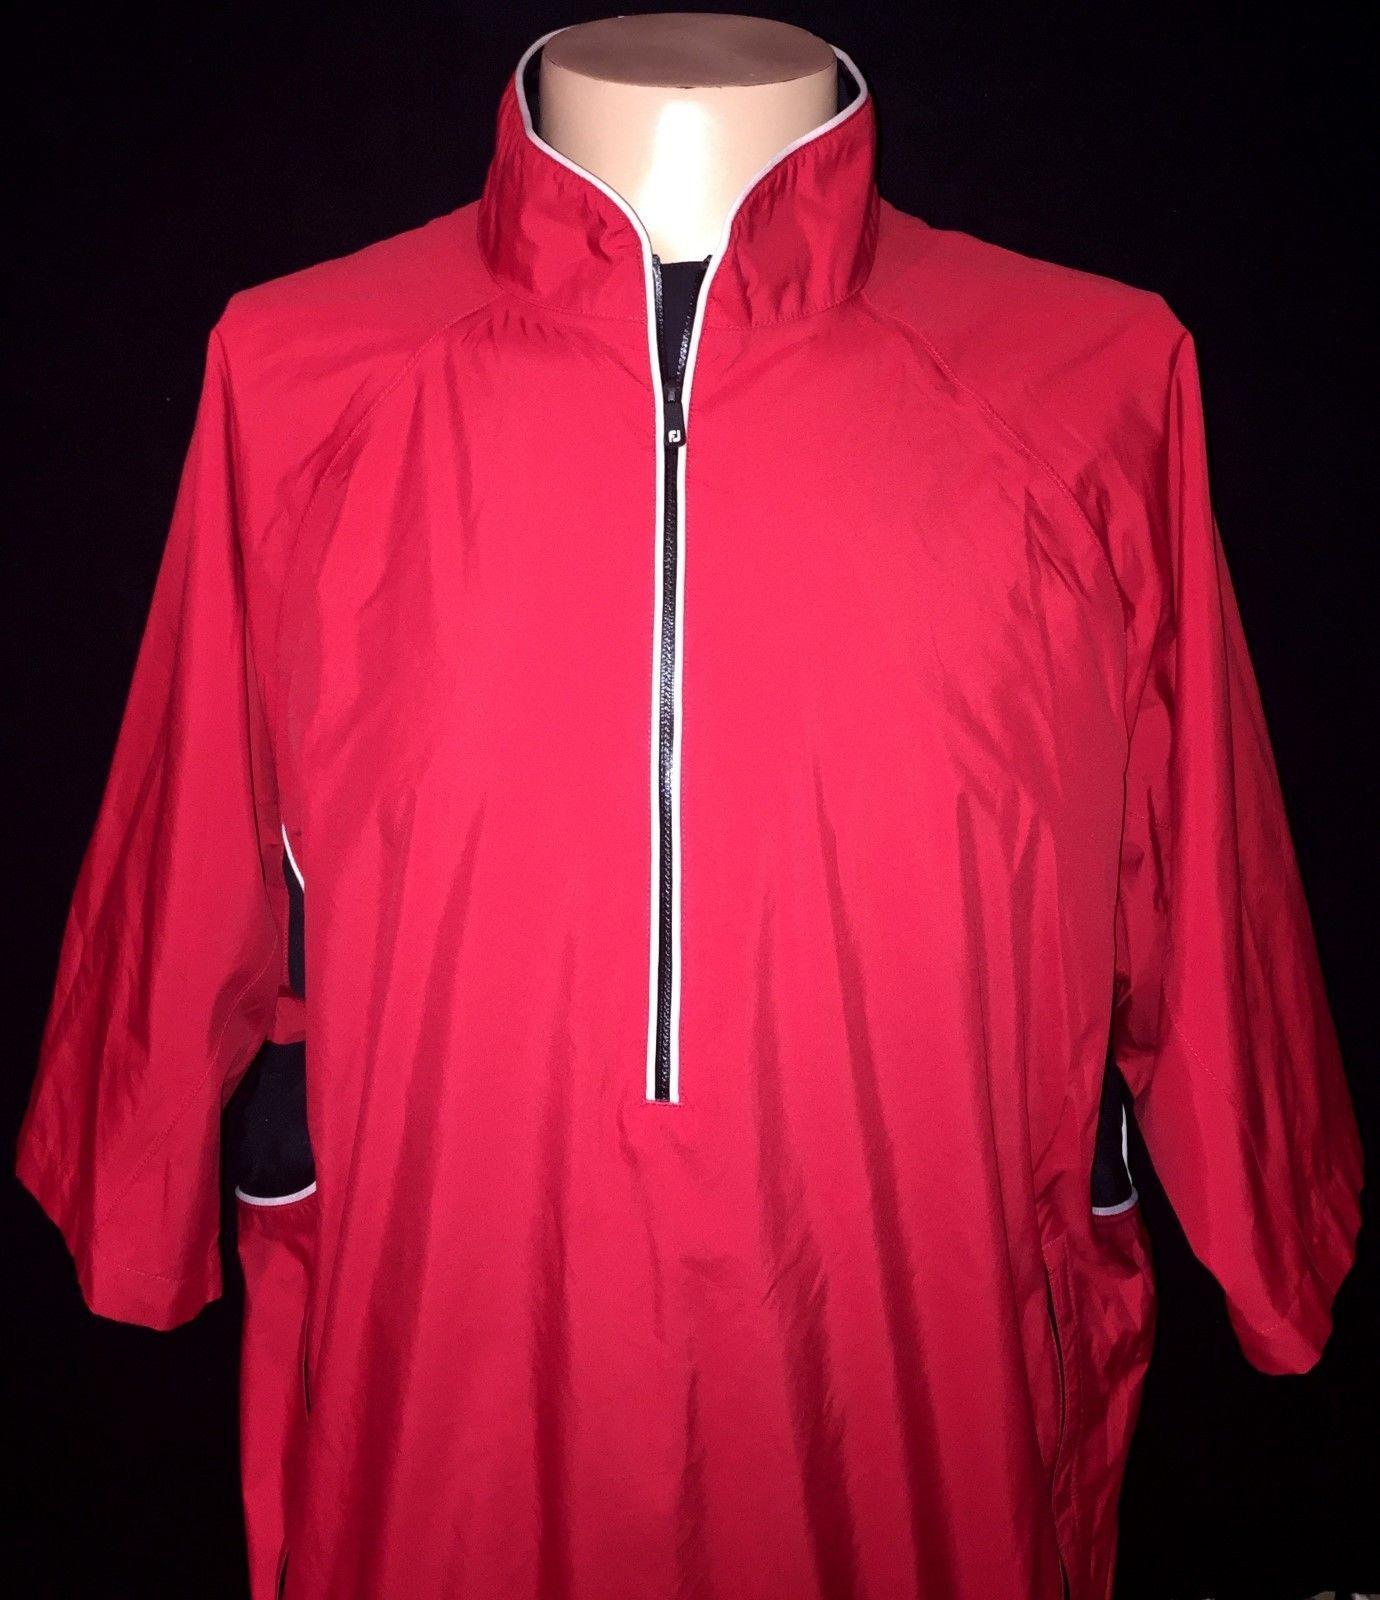 Men's FootJoy Tour Collection Red & Black Short Sleeve Golf Pullover Jacket L https://t.co/DNxjztCZFp https://t.co/6HKZe40tq3